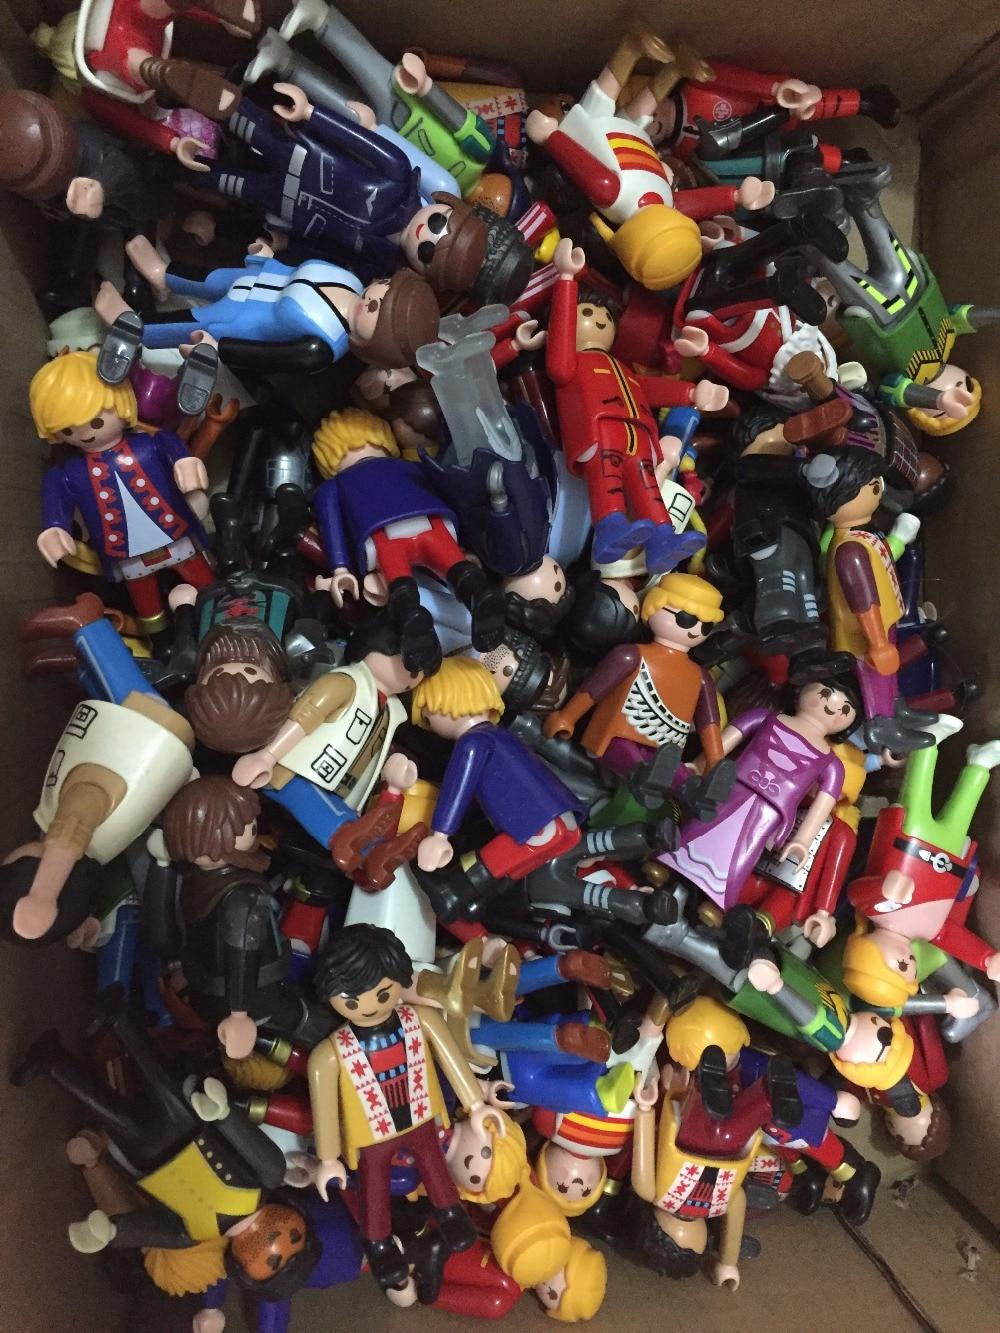 10pcs/lot 7.5cm Playmobil Dolls City toys Childrens Building Playmobil Building Blocks Bricks action figure